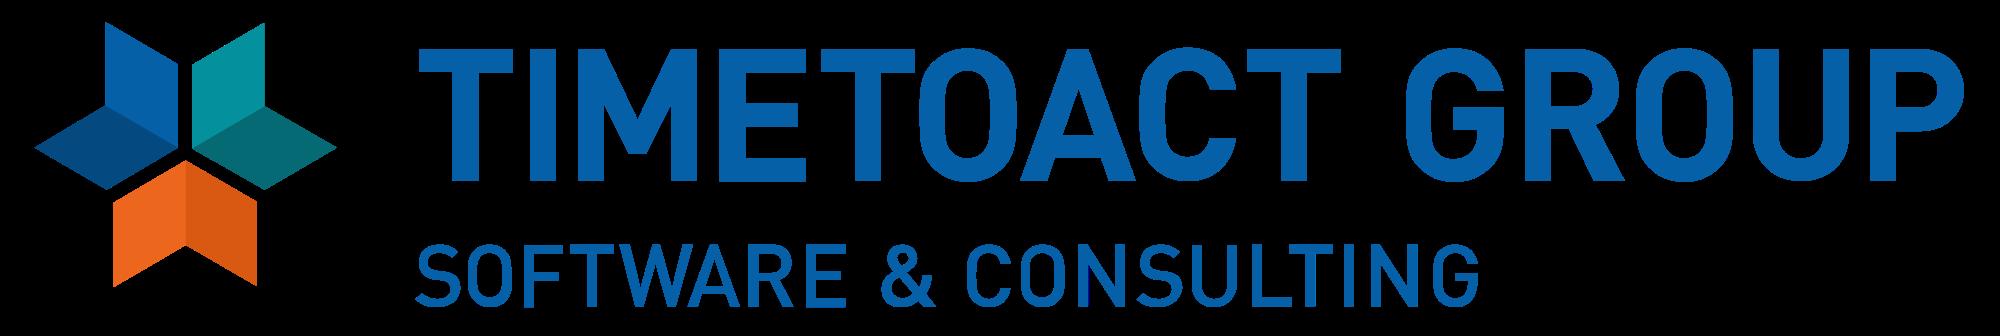 TIMETOACT GROUP